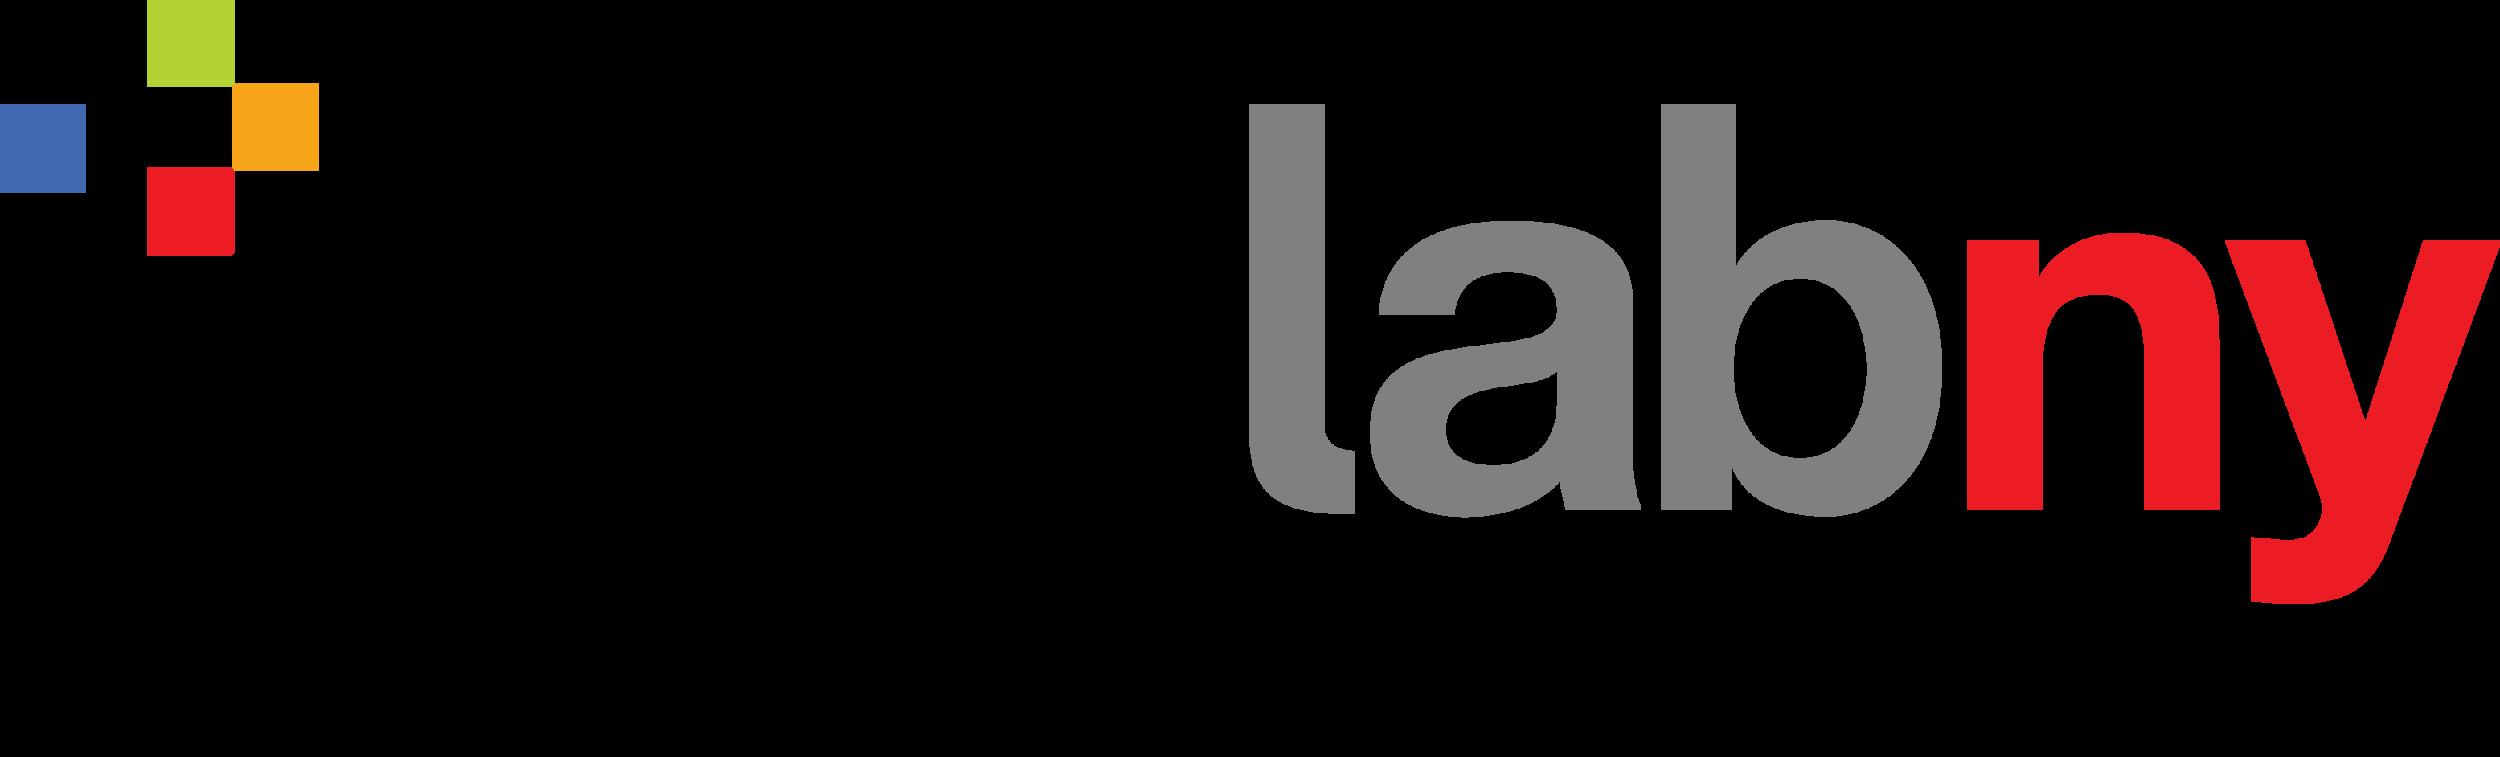 idealab_NY_logo_Revise2_2.png